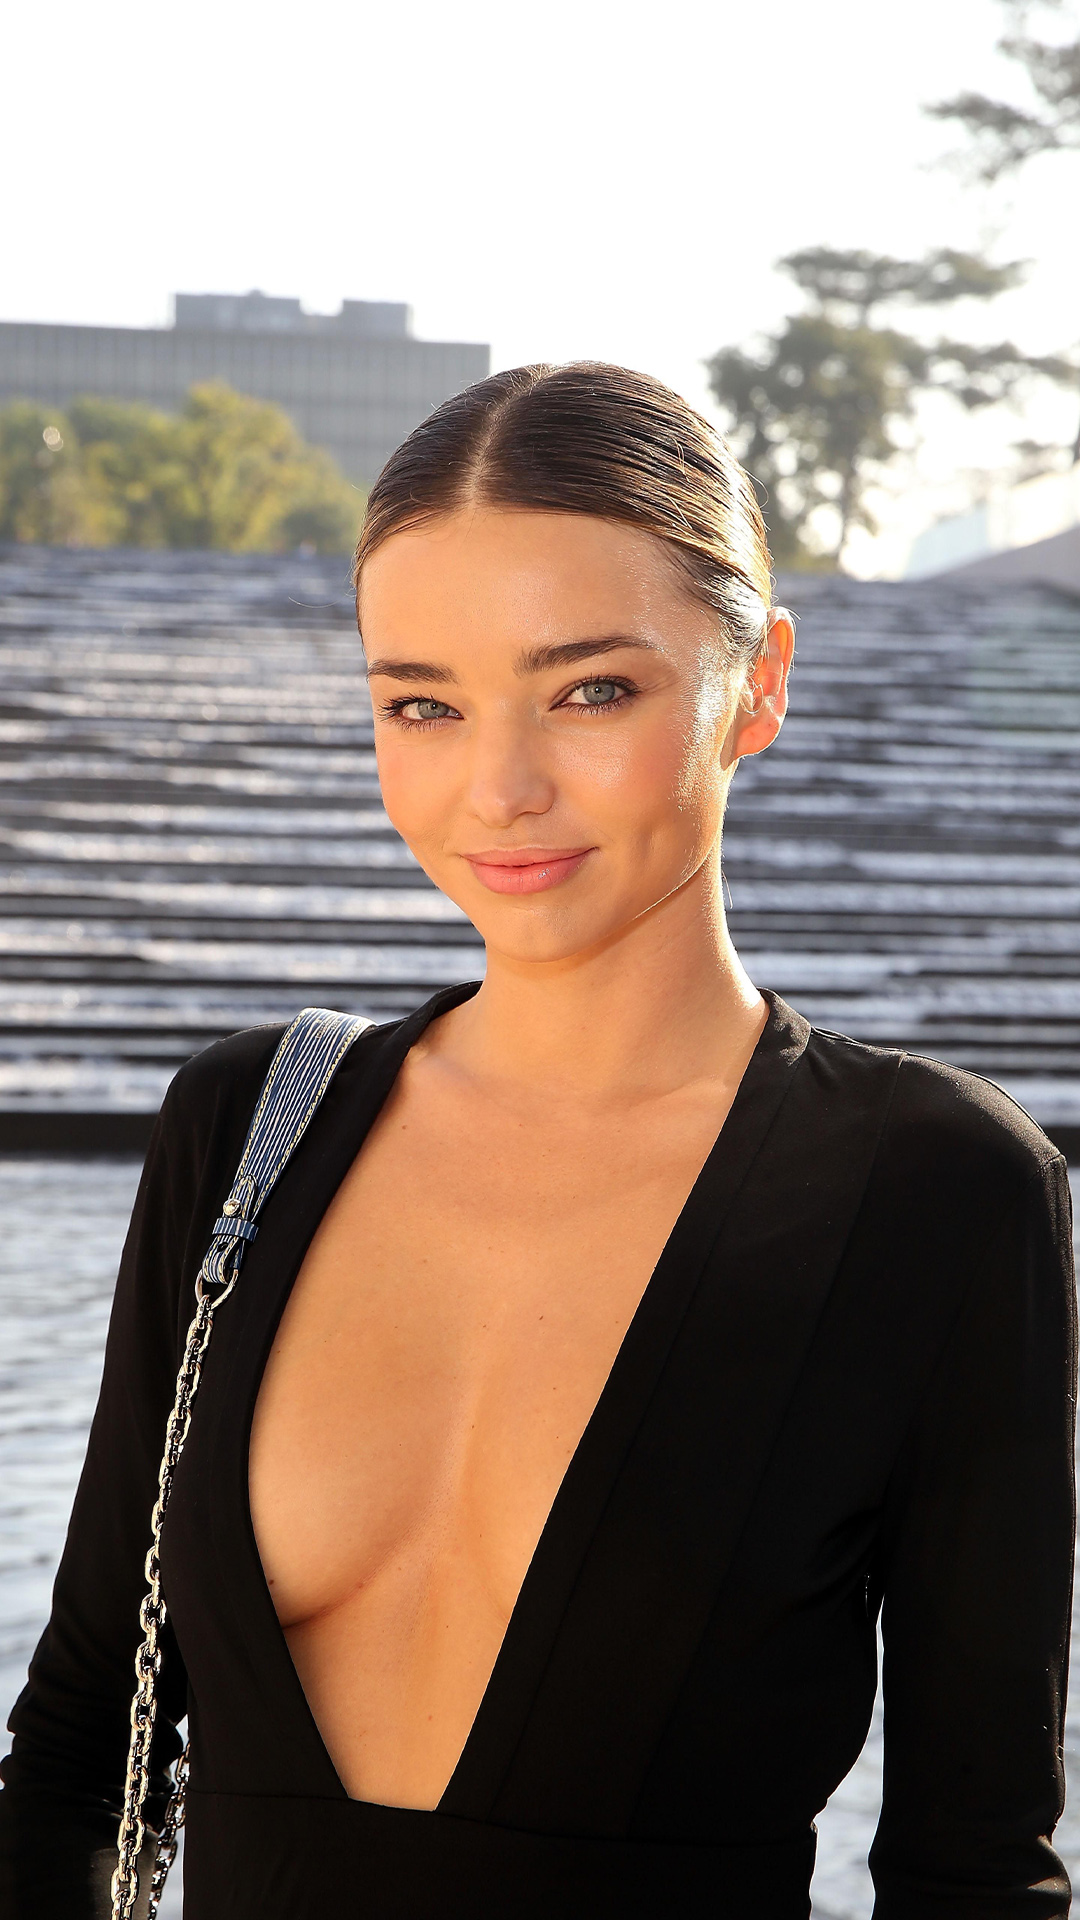 Top Model Girl Full HD Wallpapers Free Download